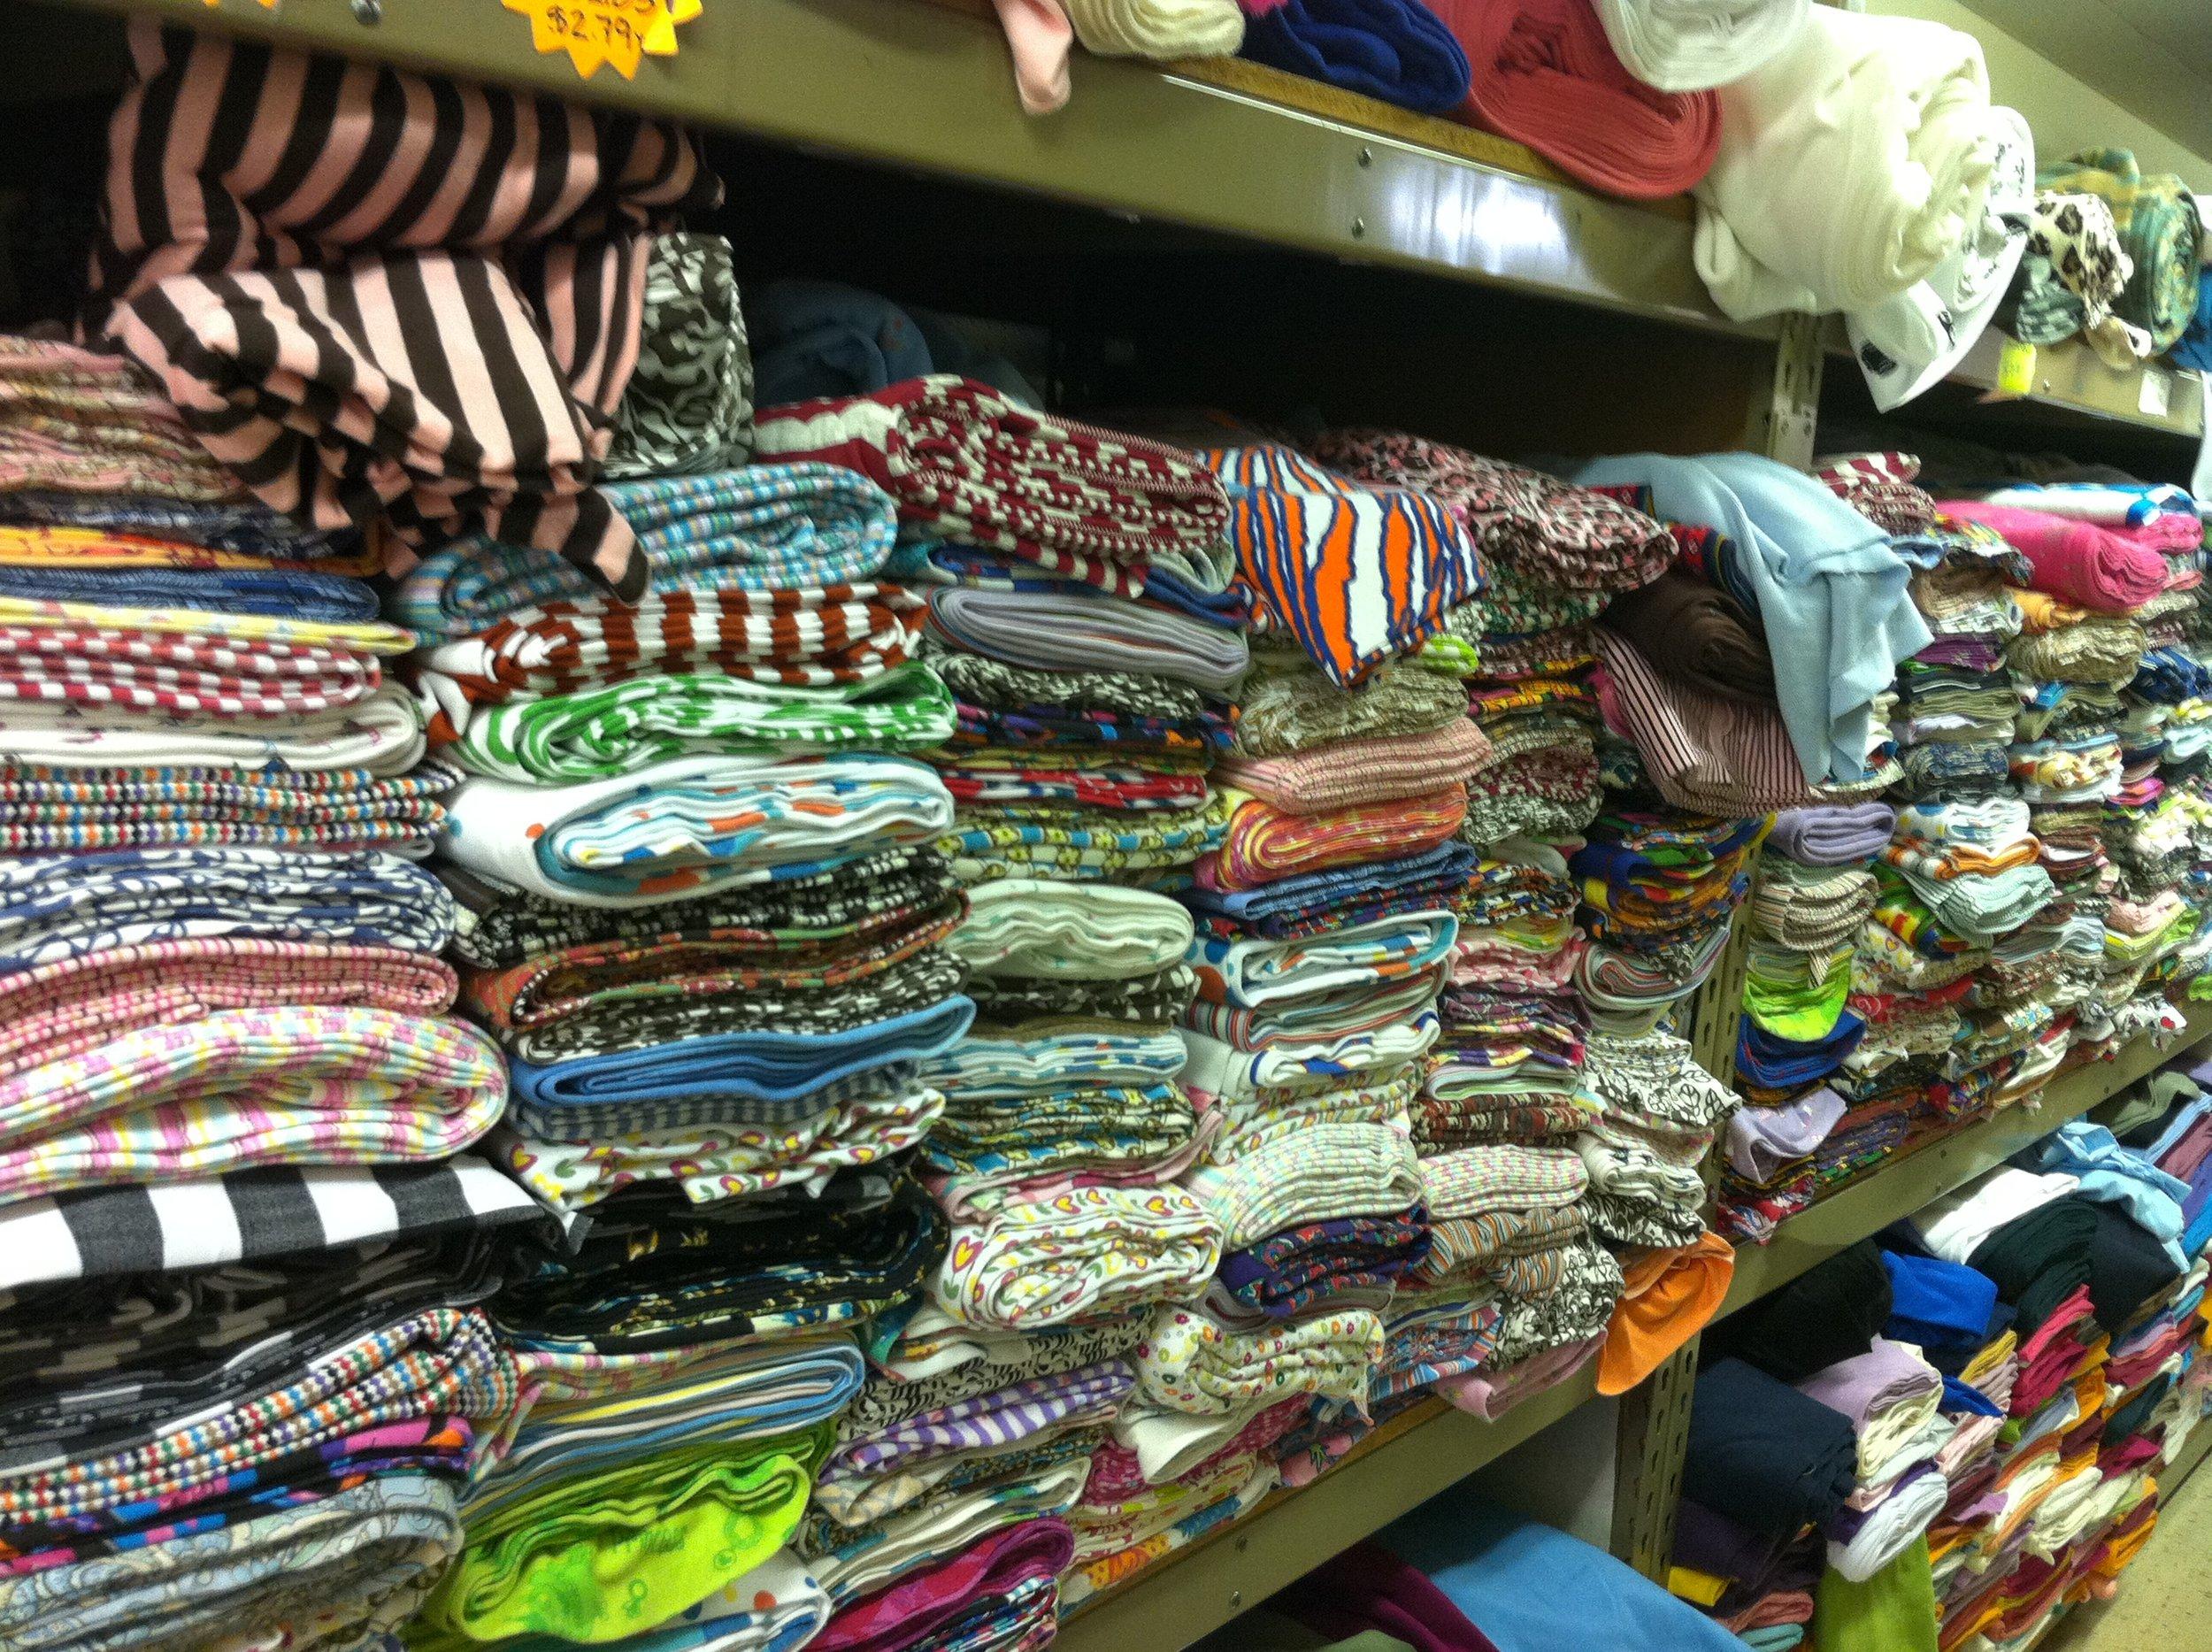 So much fabric